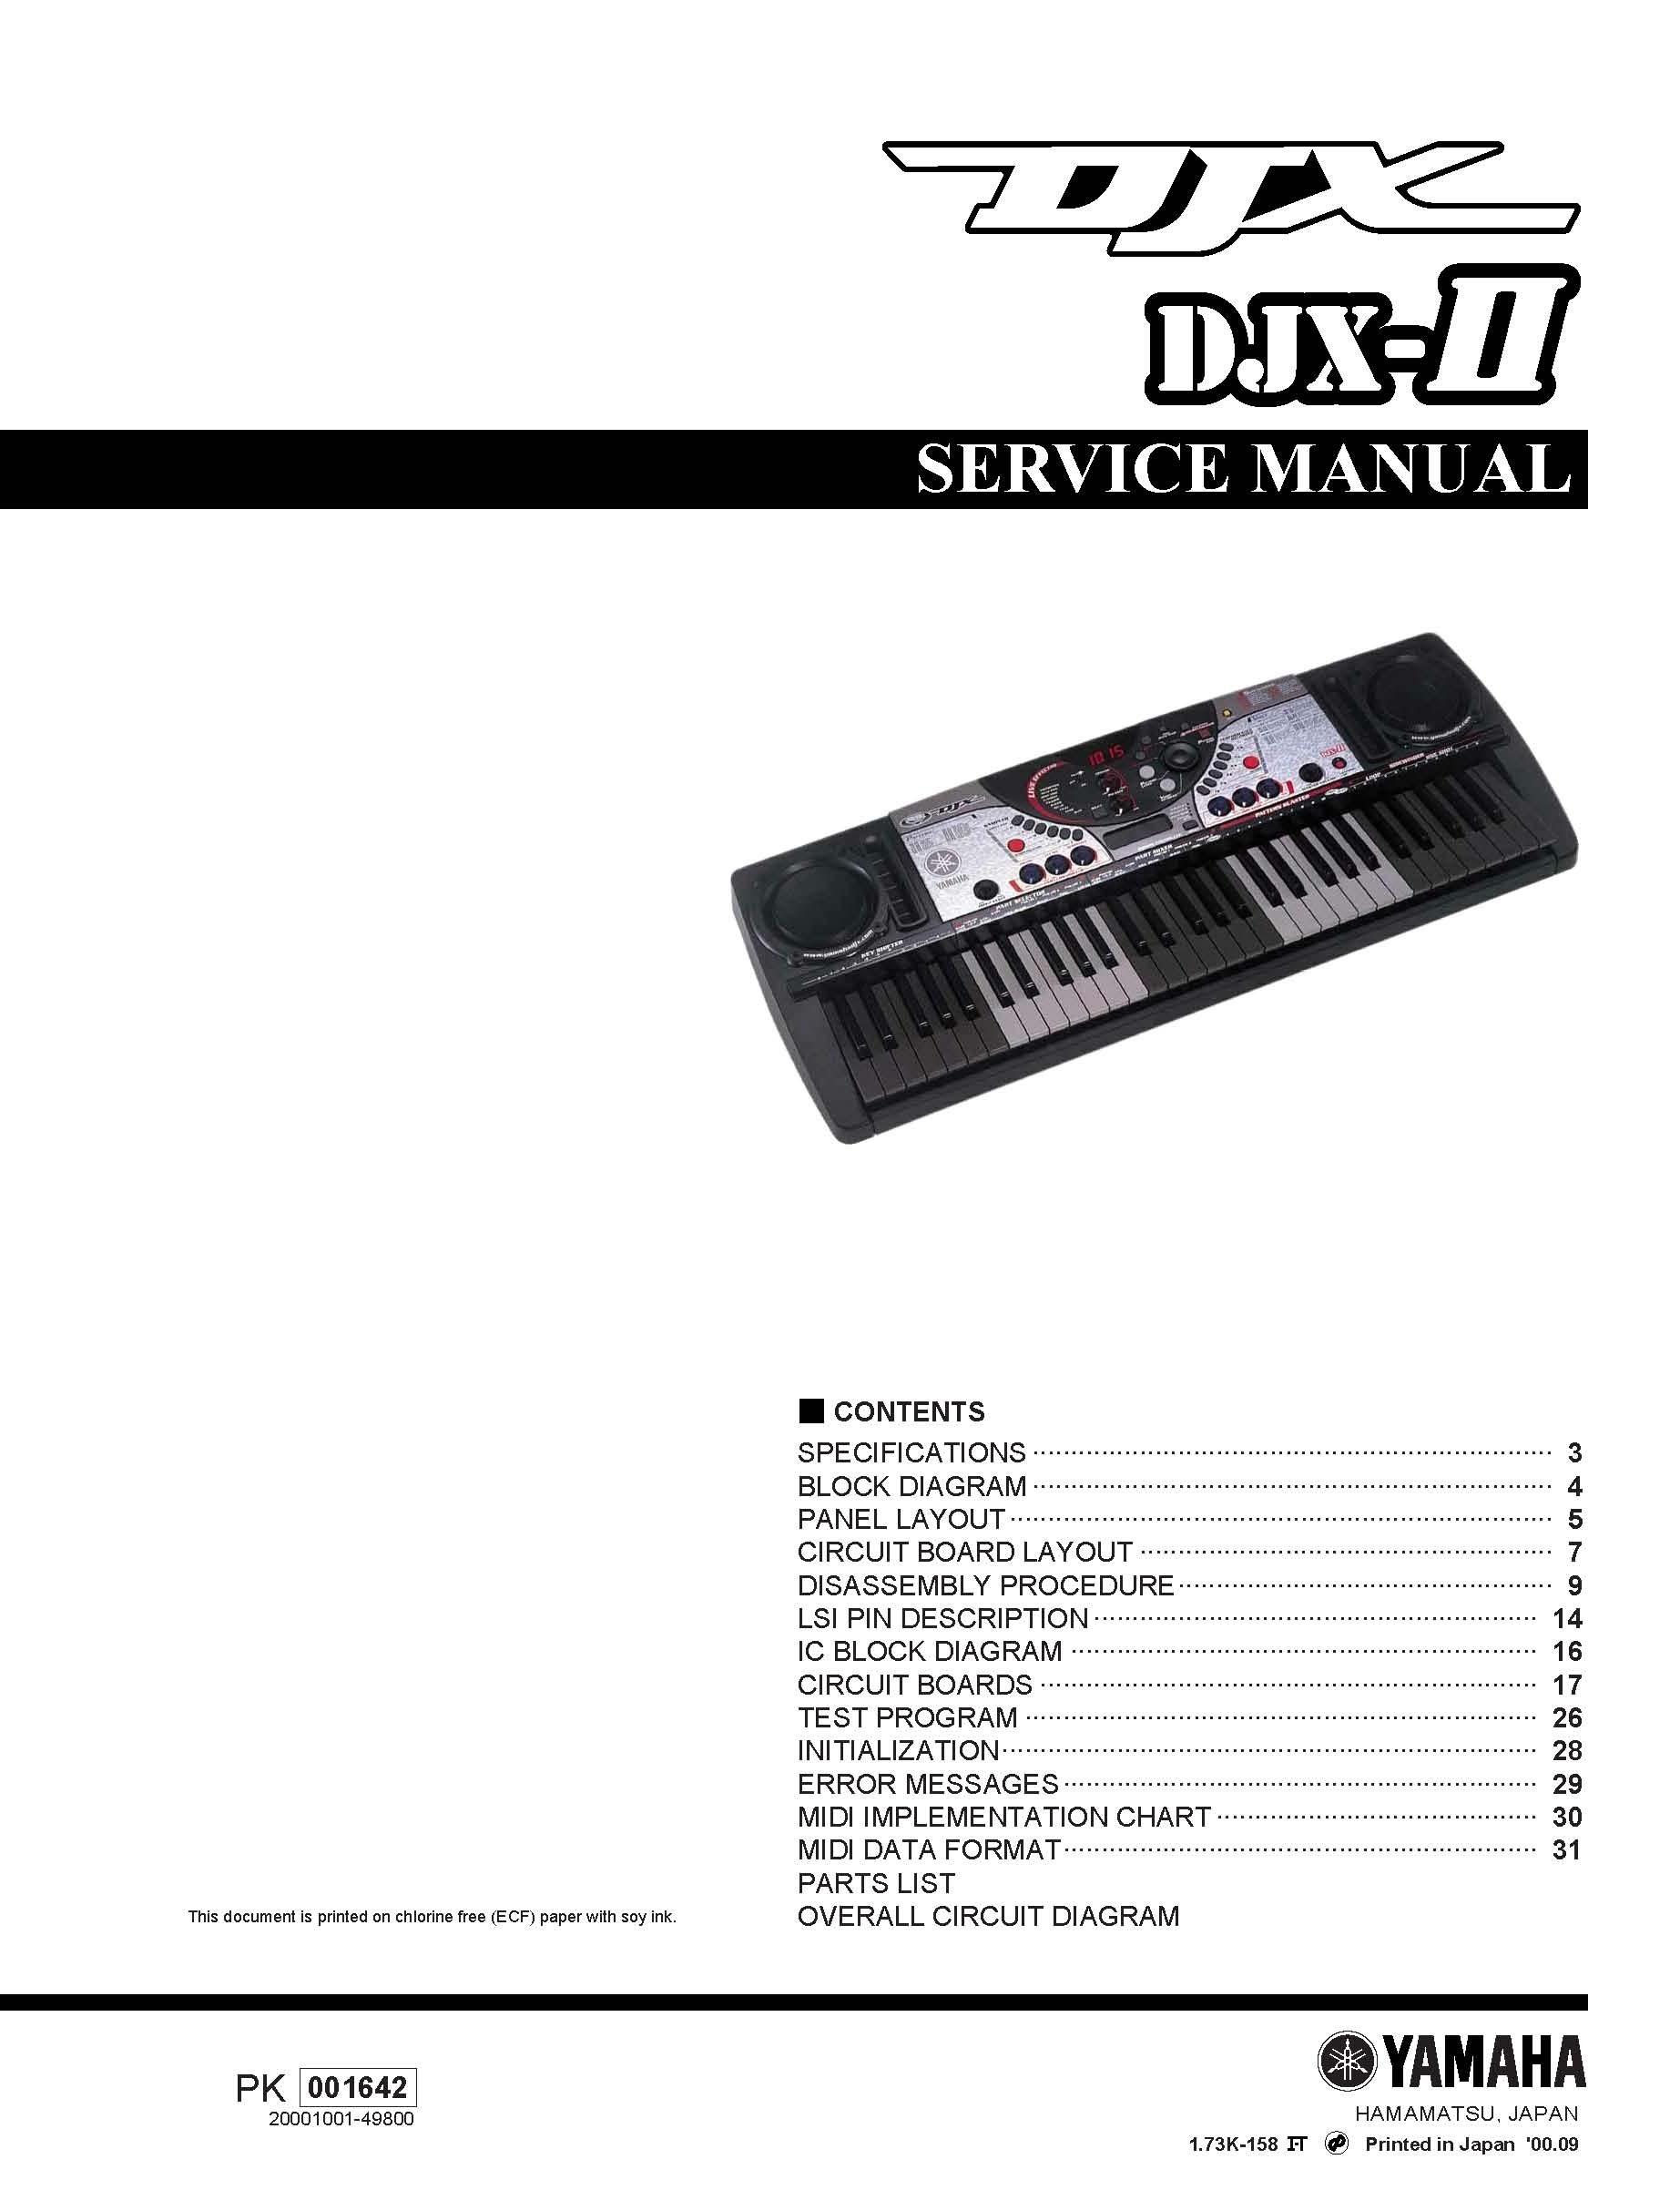 yamaha djx ii service manual music manuals rh sellfy com Yamaha DJX Minor Chords Yamaha DJX Minor Chords